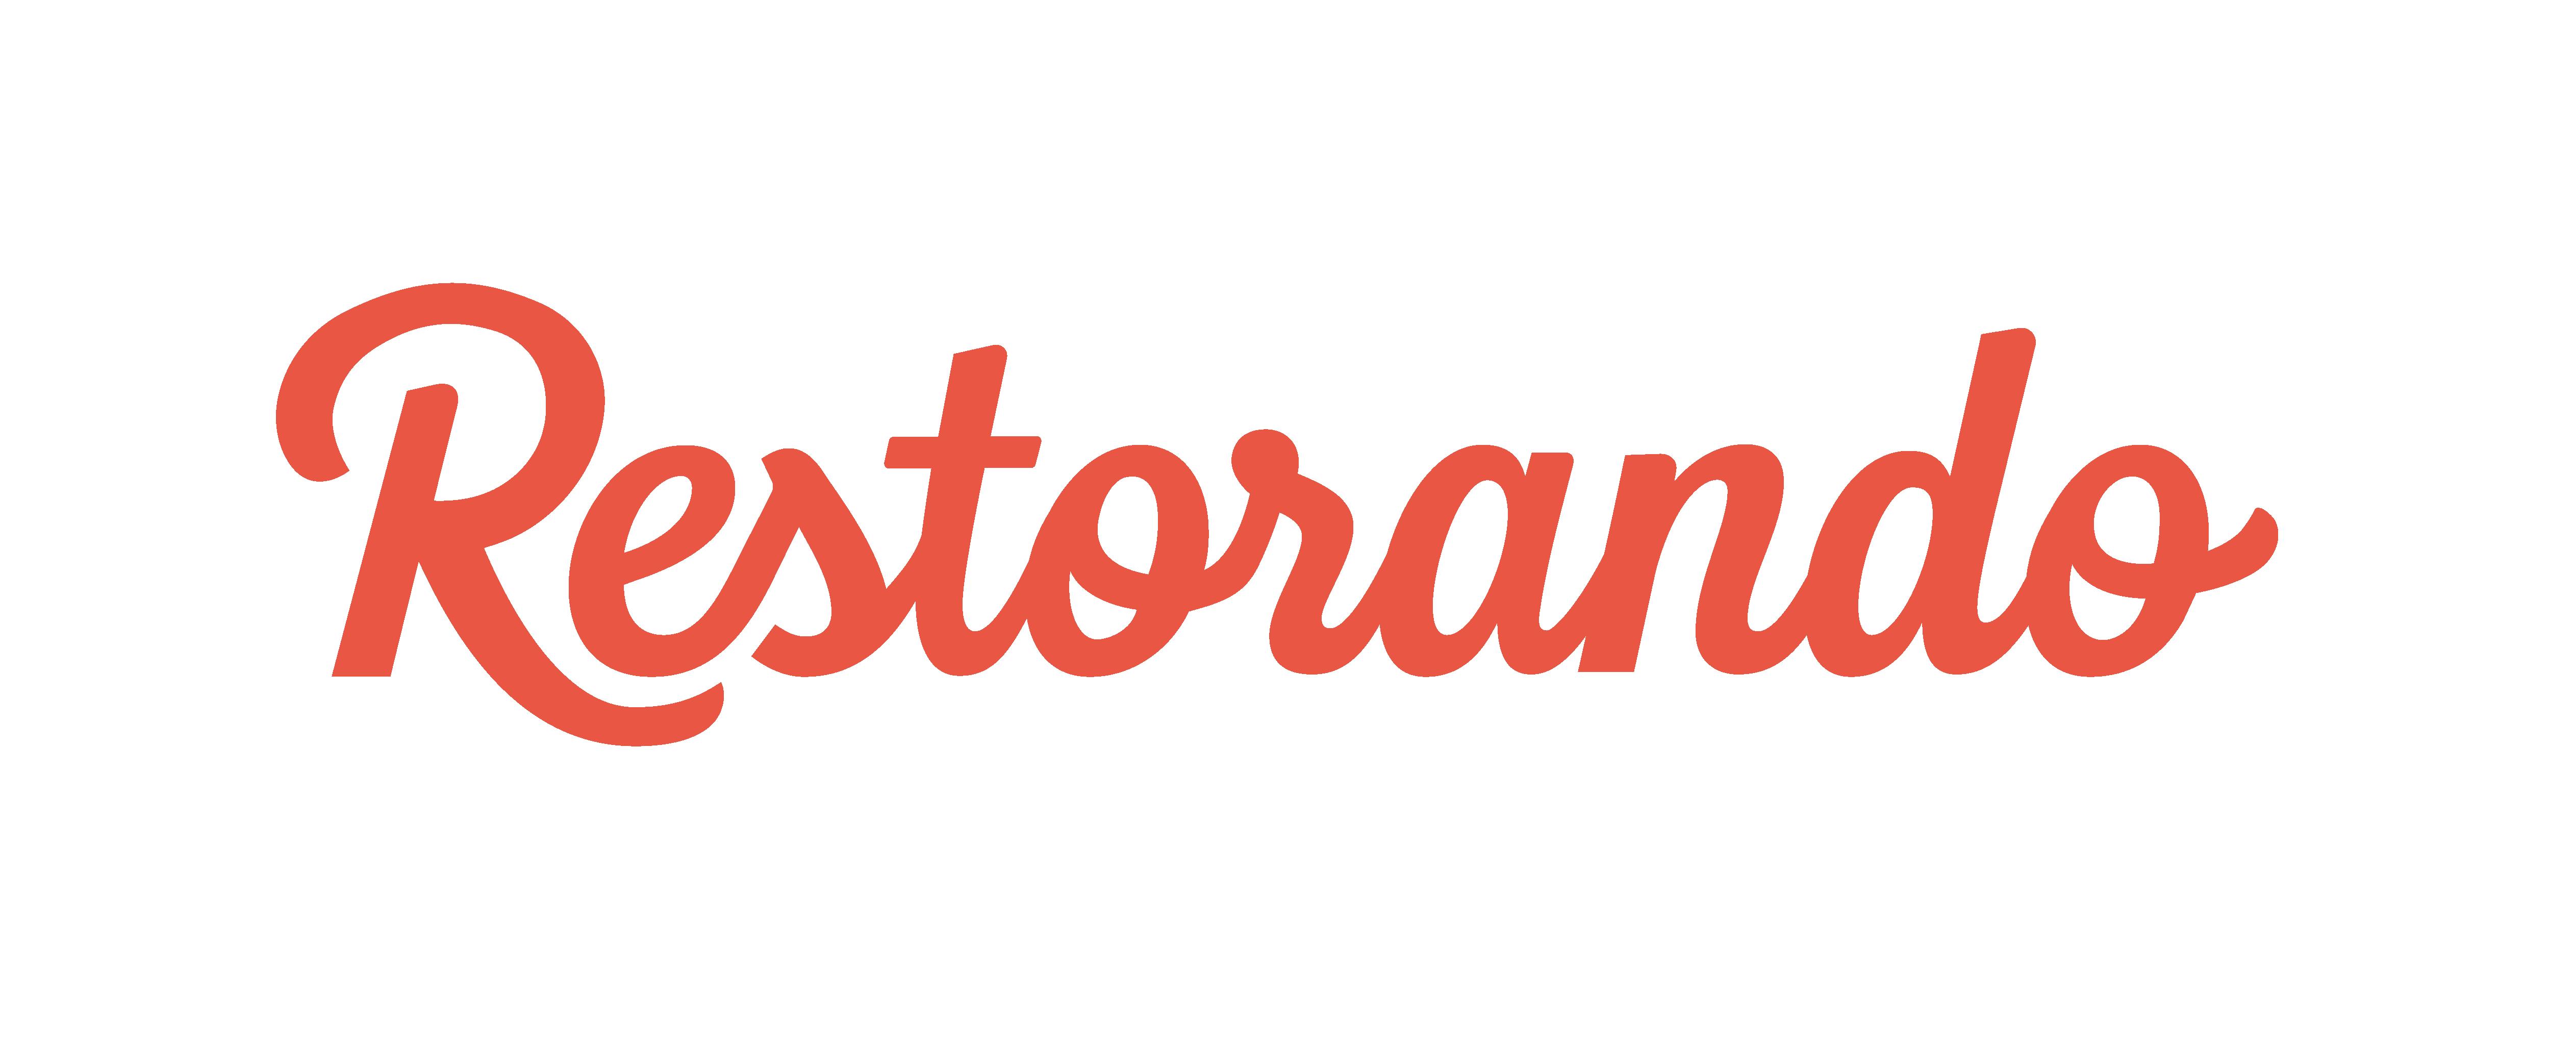 Restorando Partners With TripAdvisor In Seven Latin American